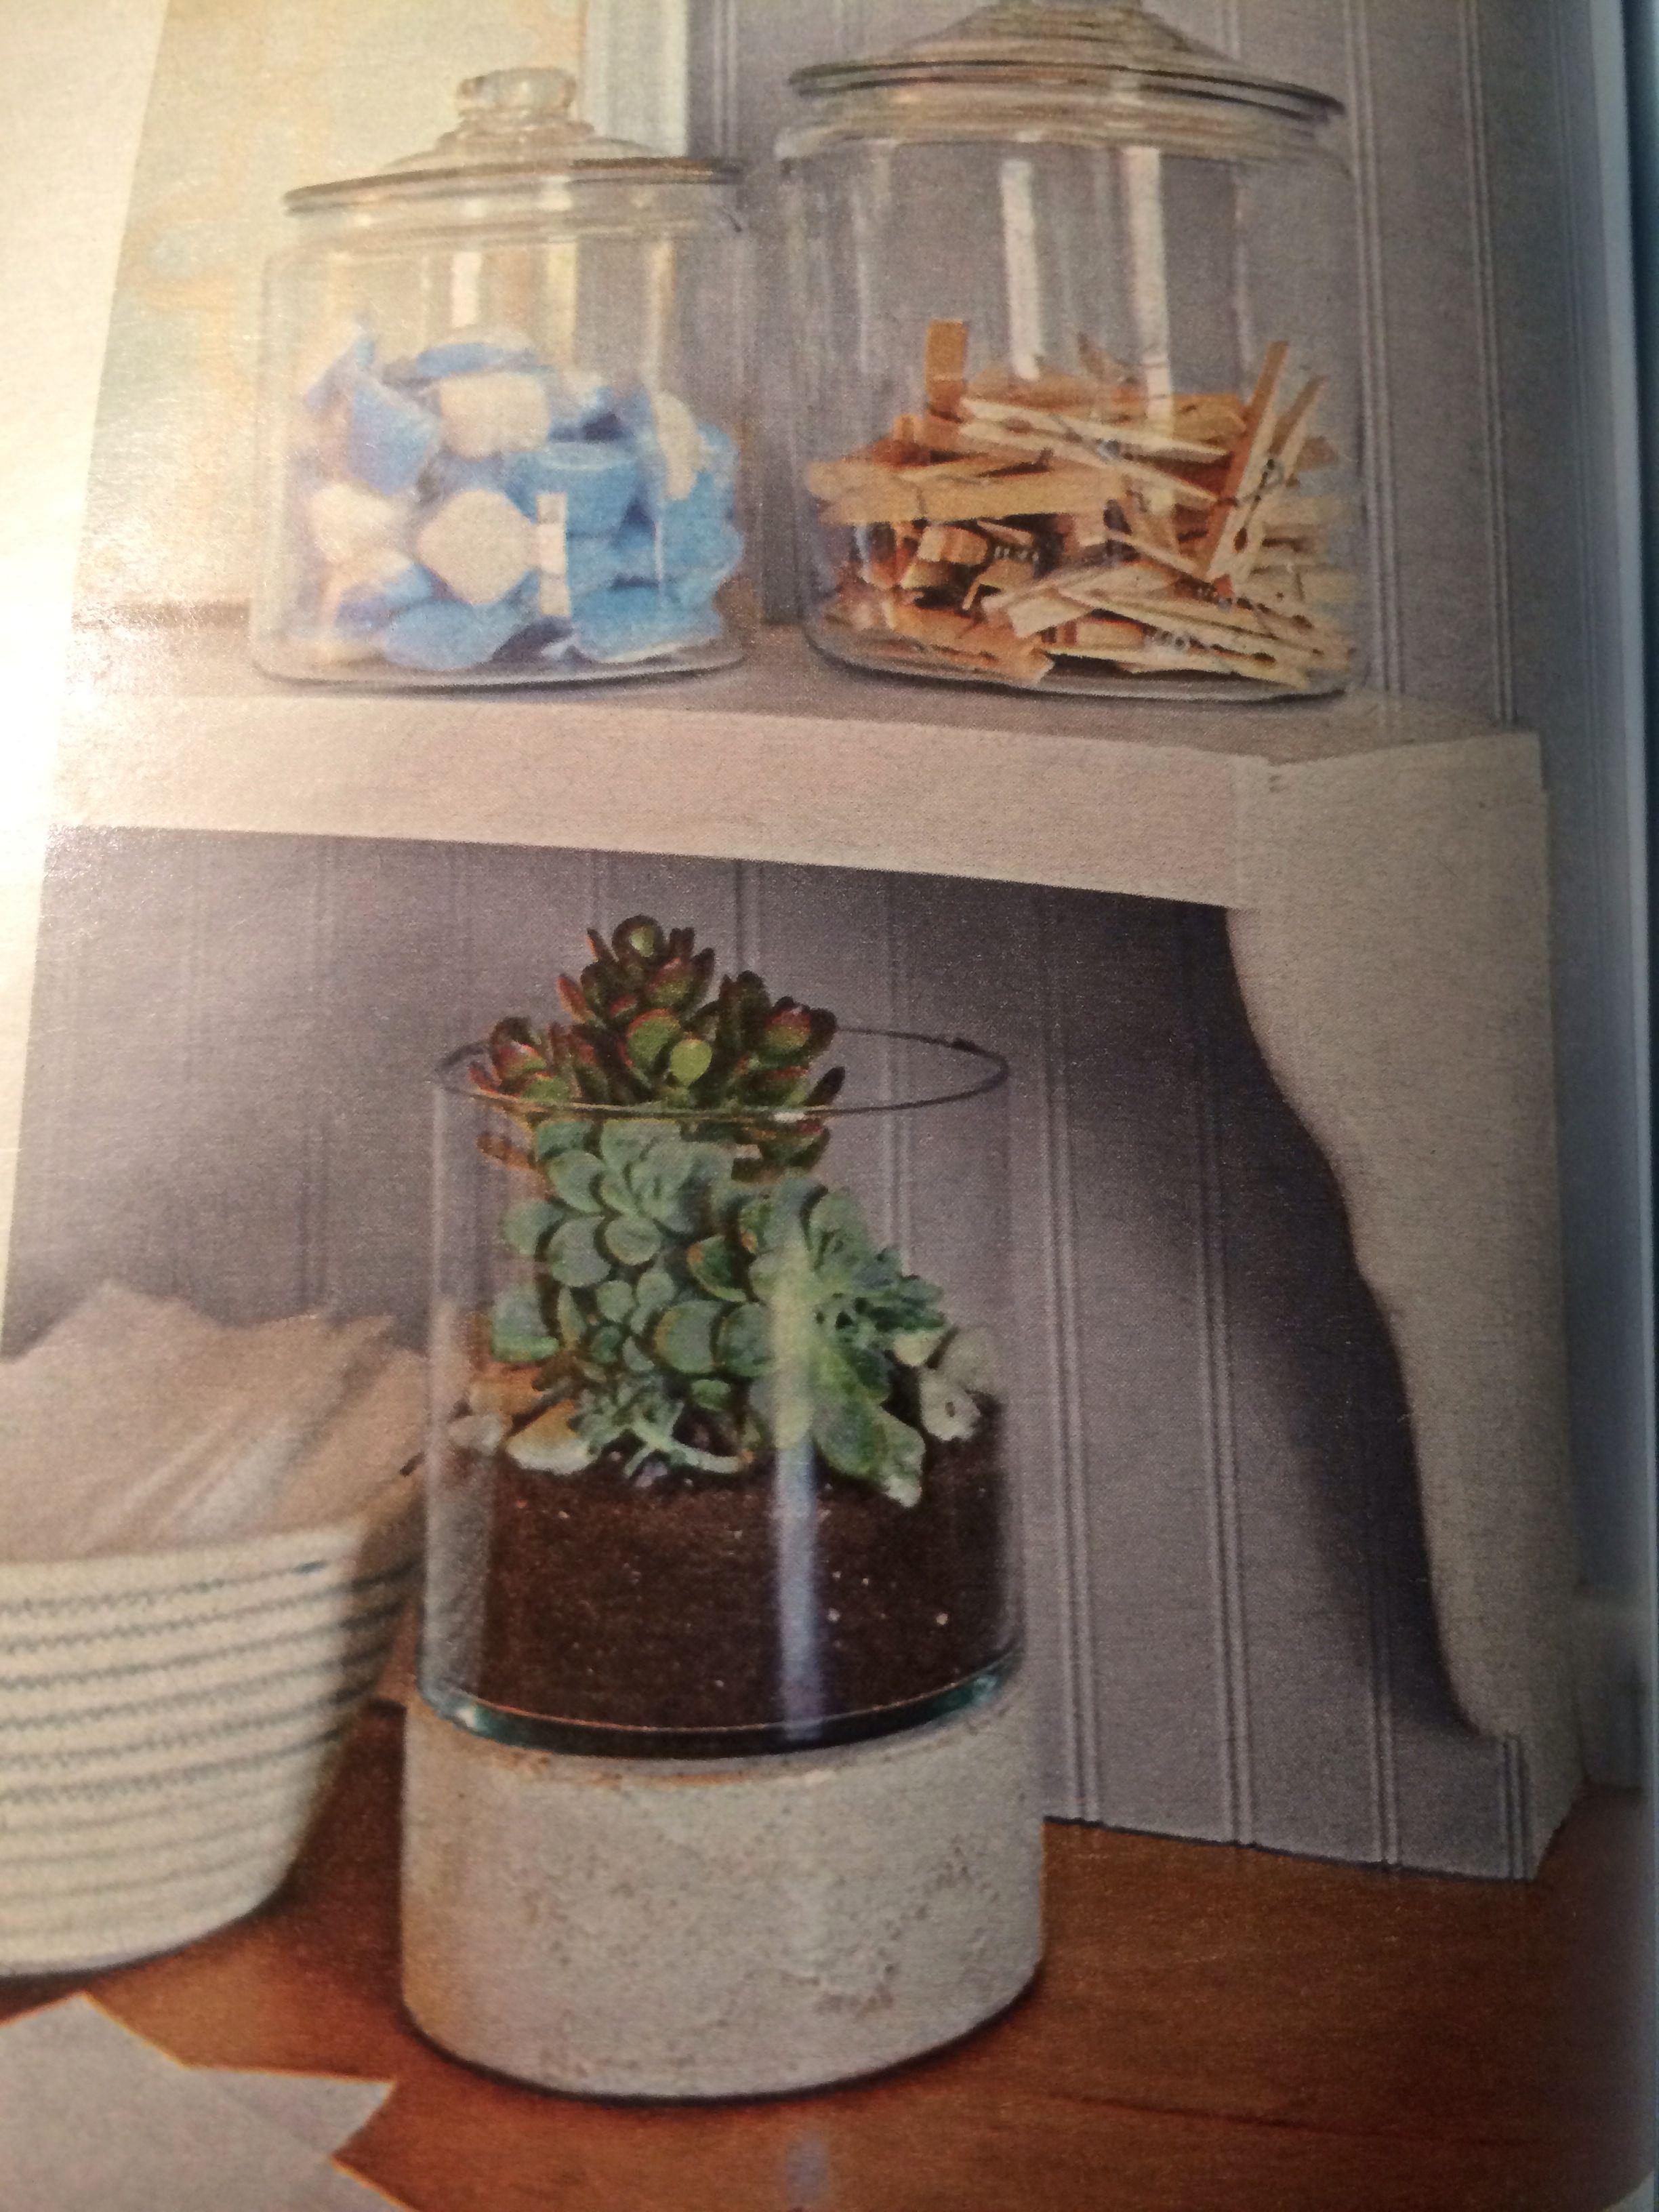 washer dryer hookups hidden behind bead board panel with removable shelf bhg feb 39 14 laundry. Black Bedroom Furniture Sets. Home Design Ideas